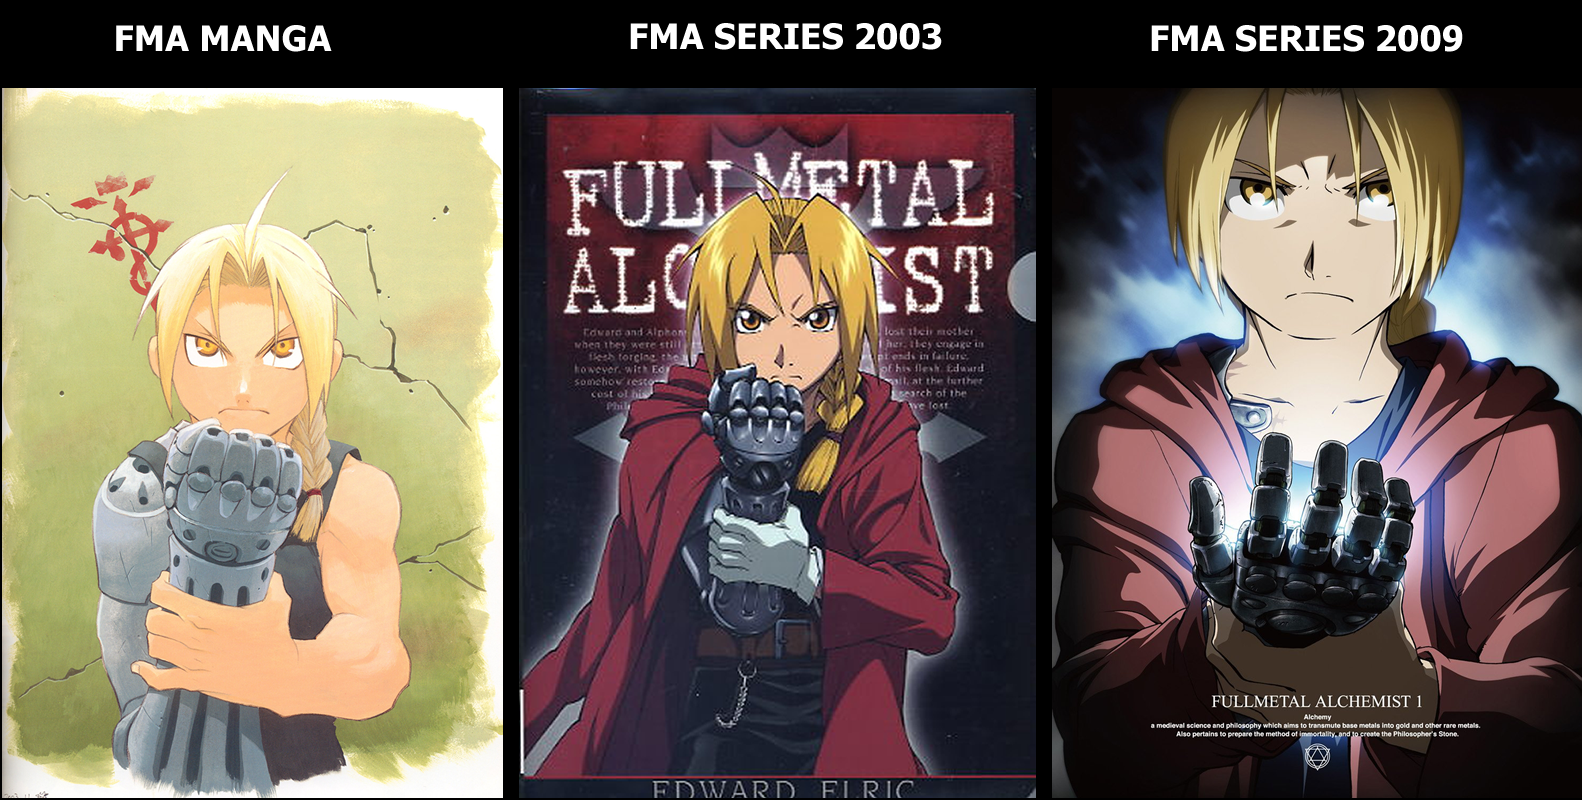 Fma manga vs fma 2003 vs fma 2009 3 by joaocouto deviantart com on deviantart